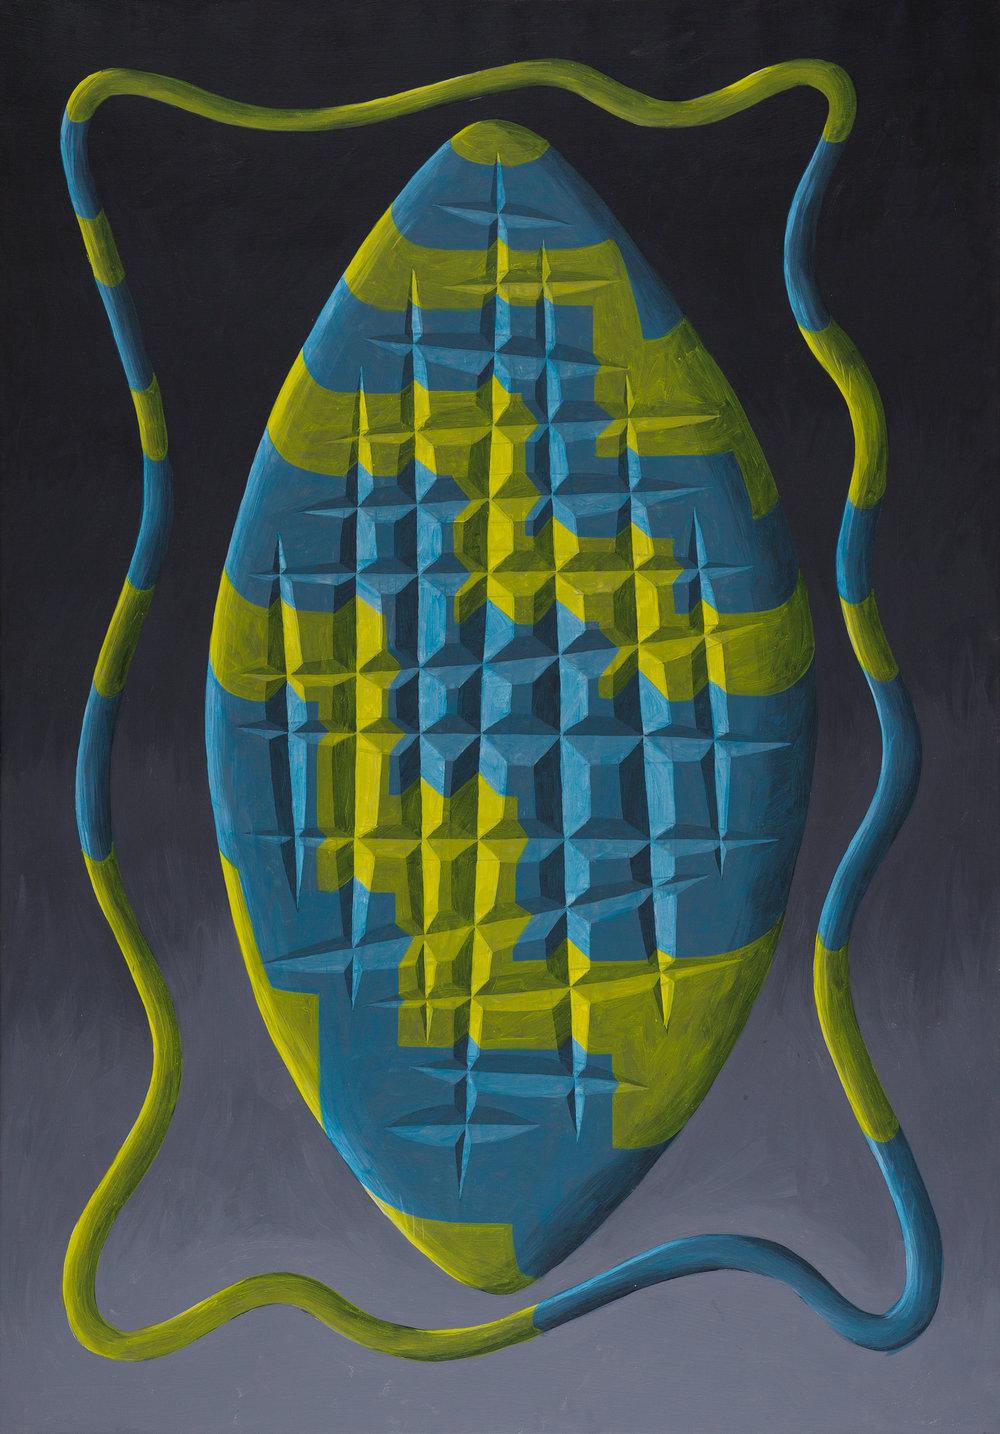 Peter Schuyff   Kali II  1984 Acrylic on canvas 168 x 117 cm